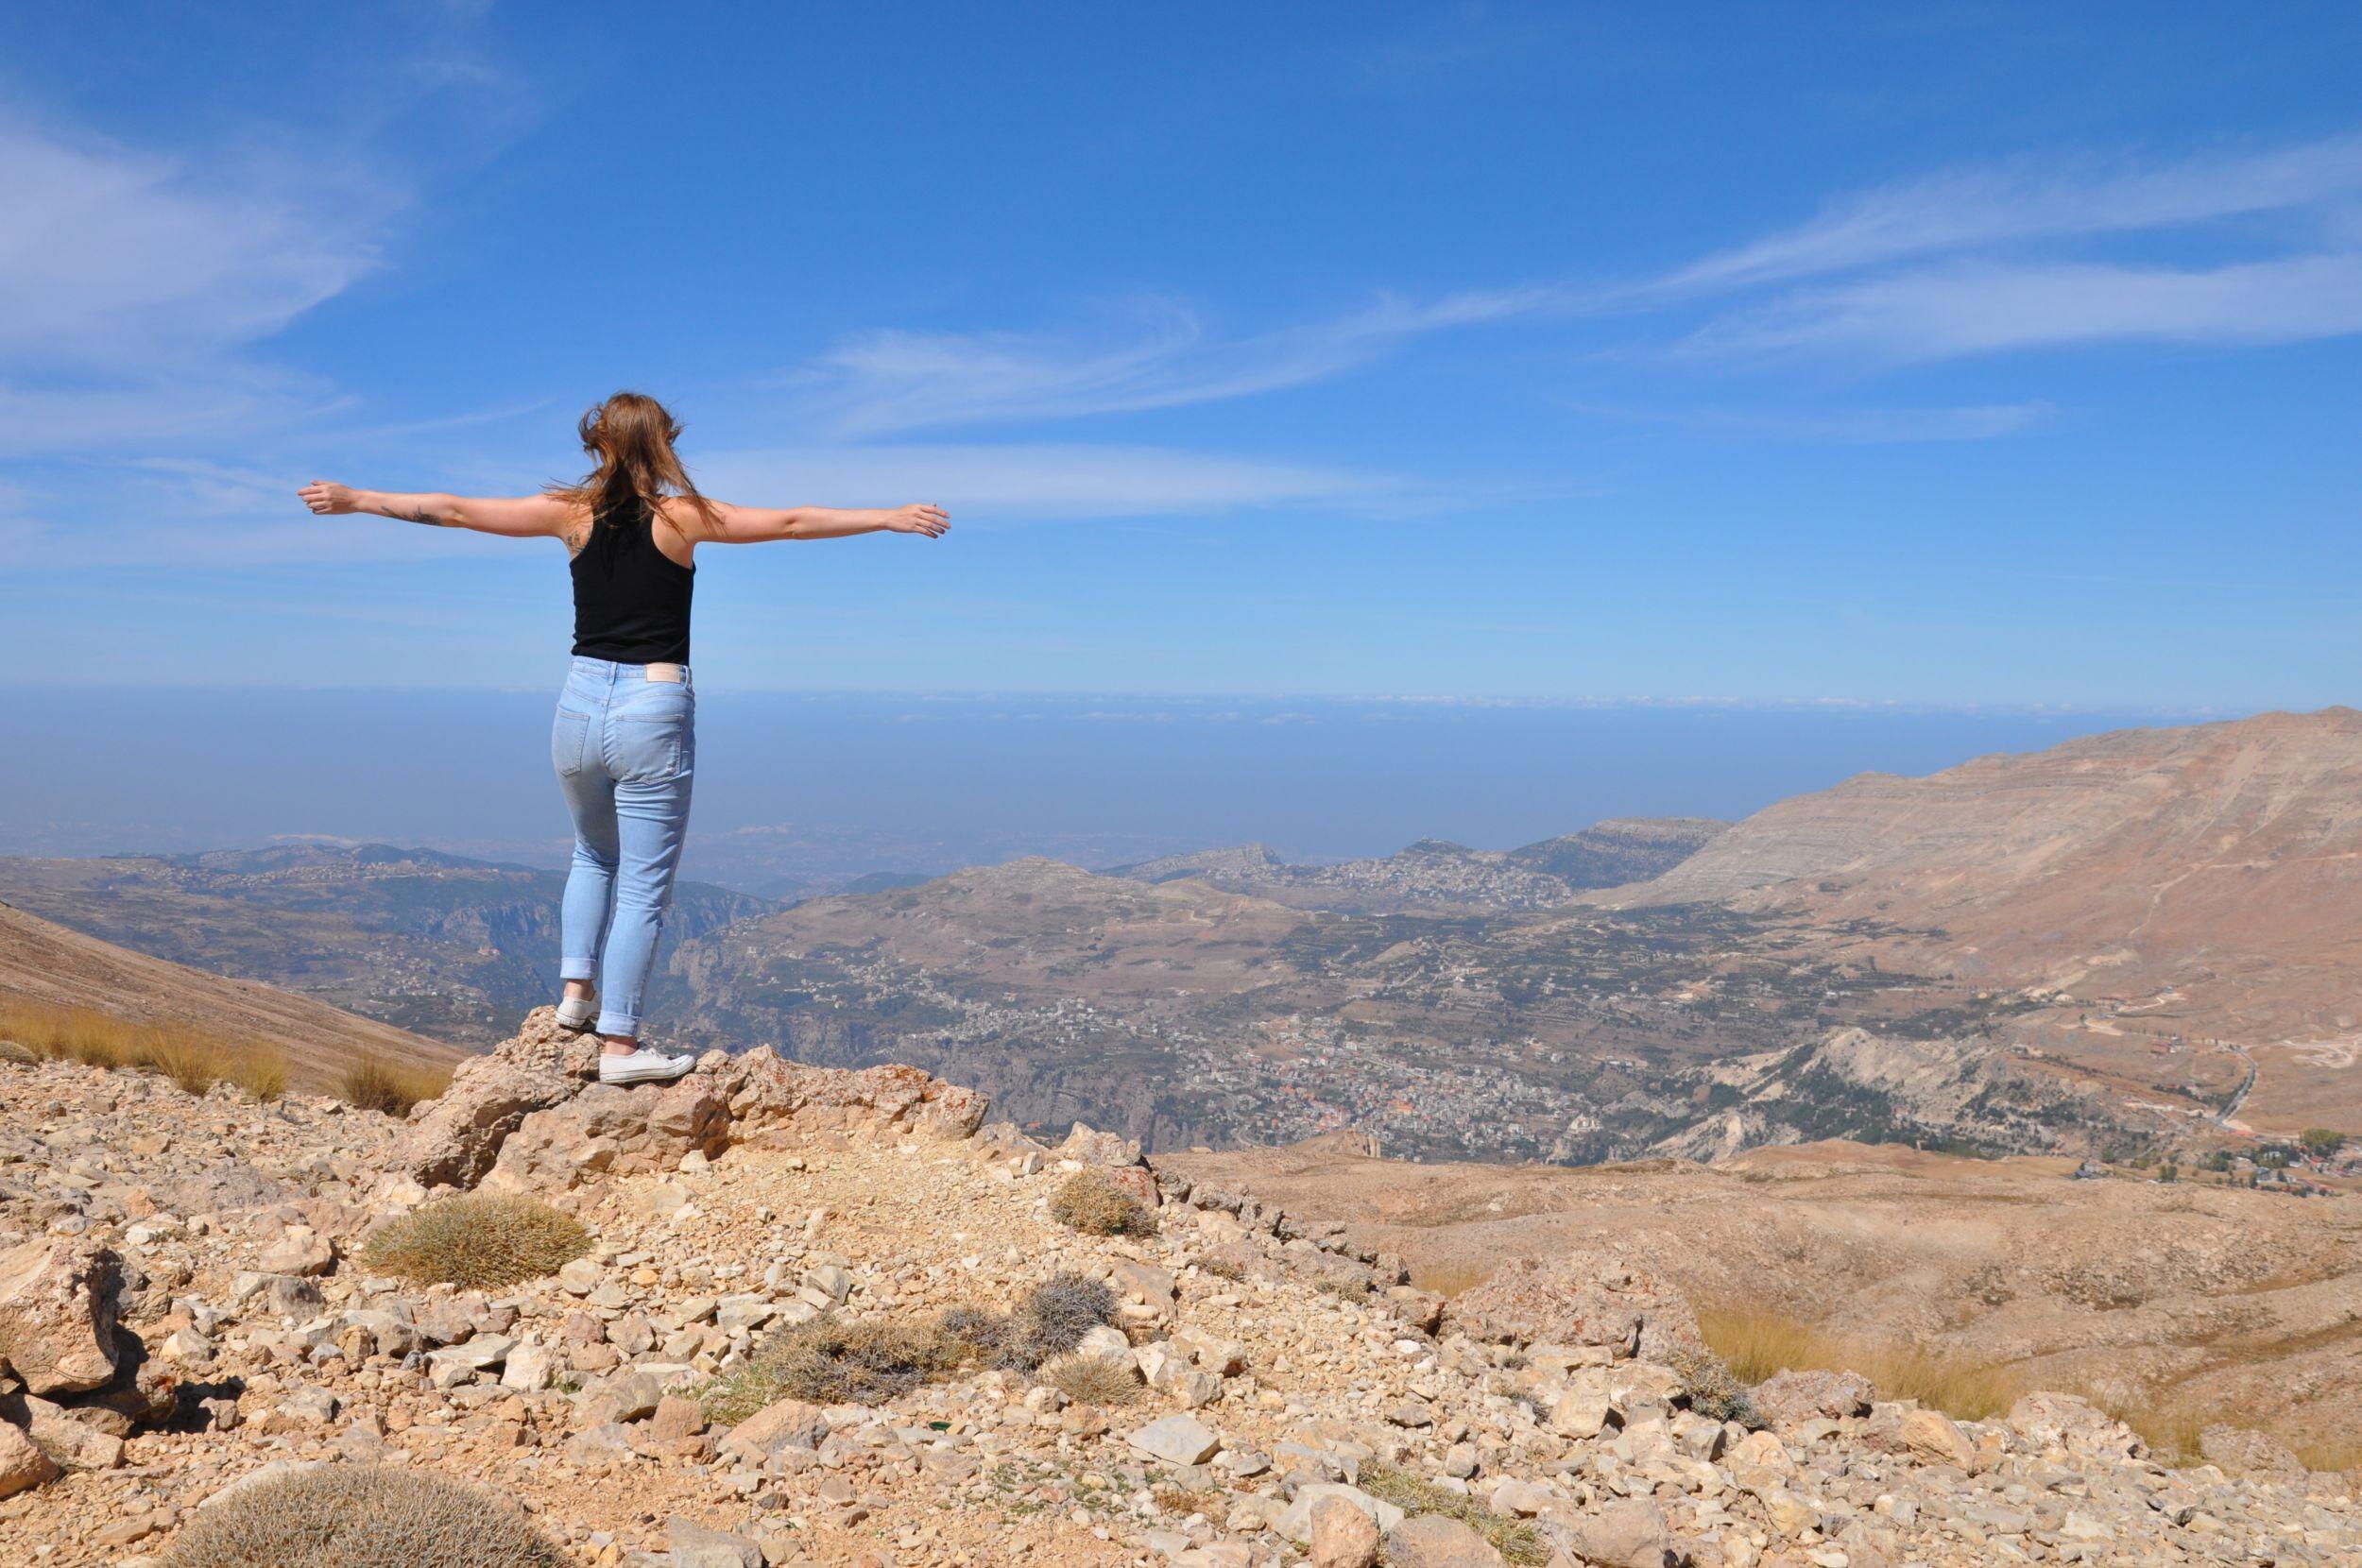 Výhled z vrcholu hory-Aneta Viktorová